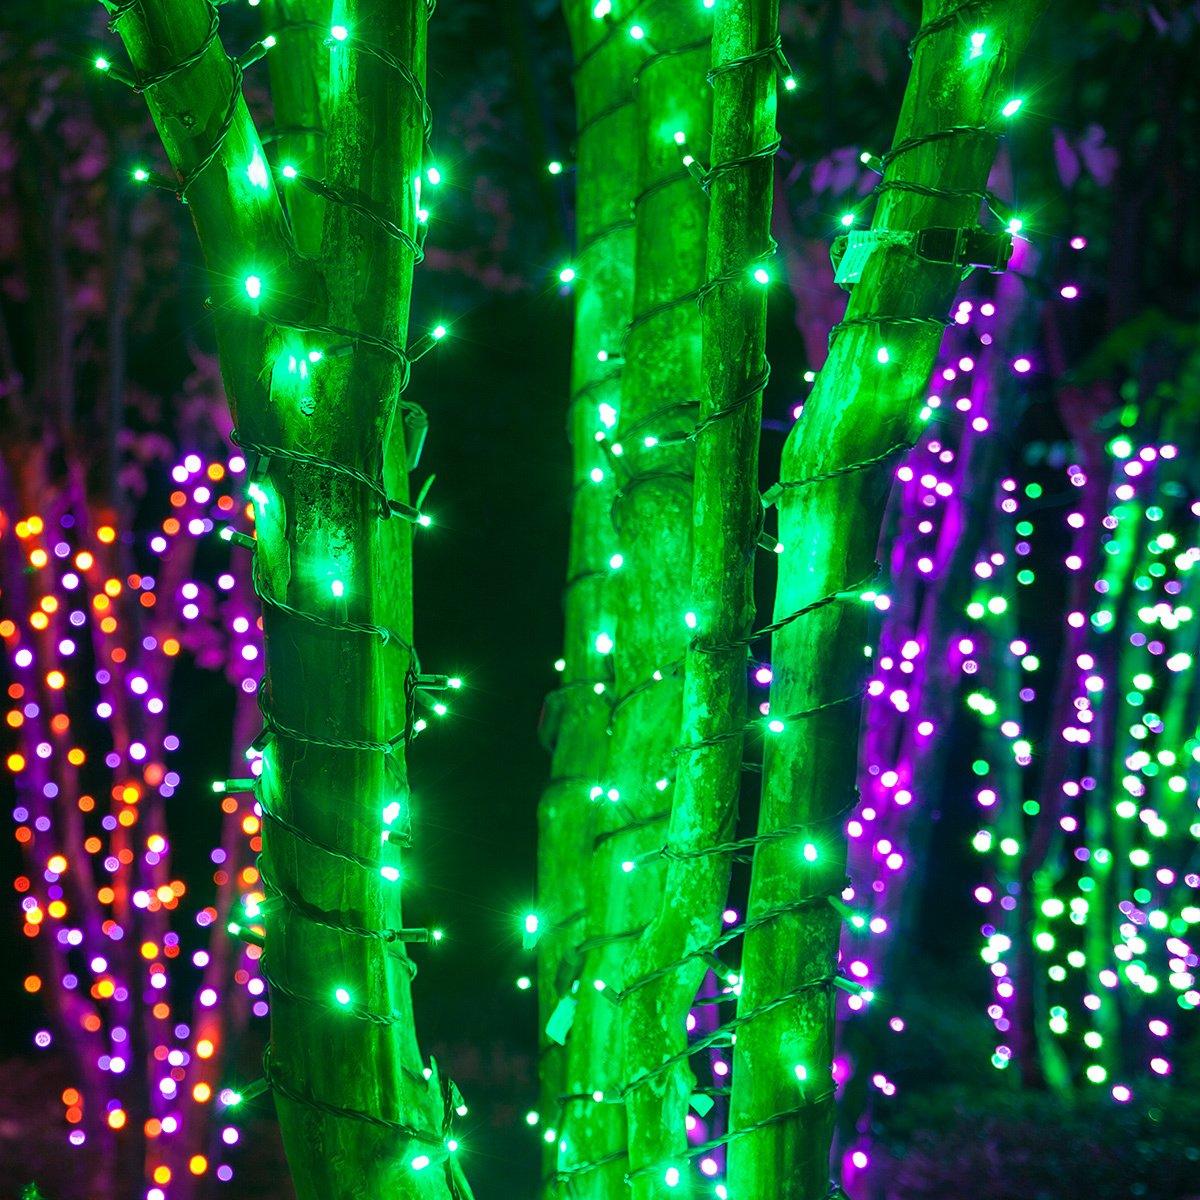 Amazon.com: LED Christmas Mini Light Set, 5mm Lights, Indoor ...